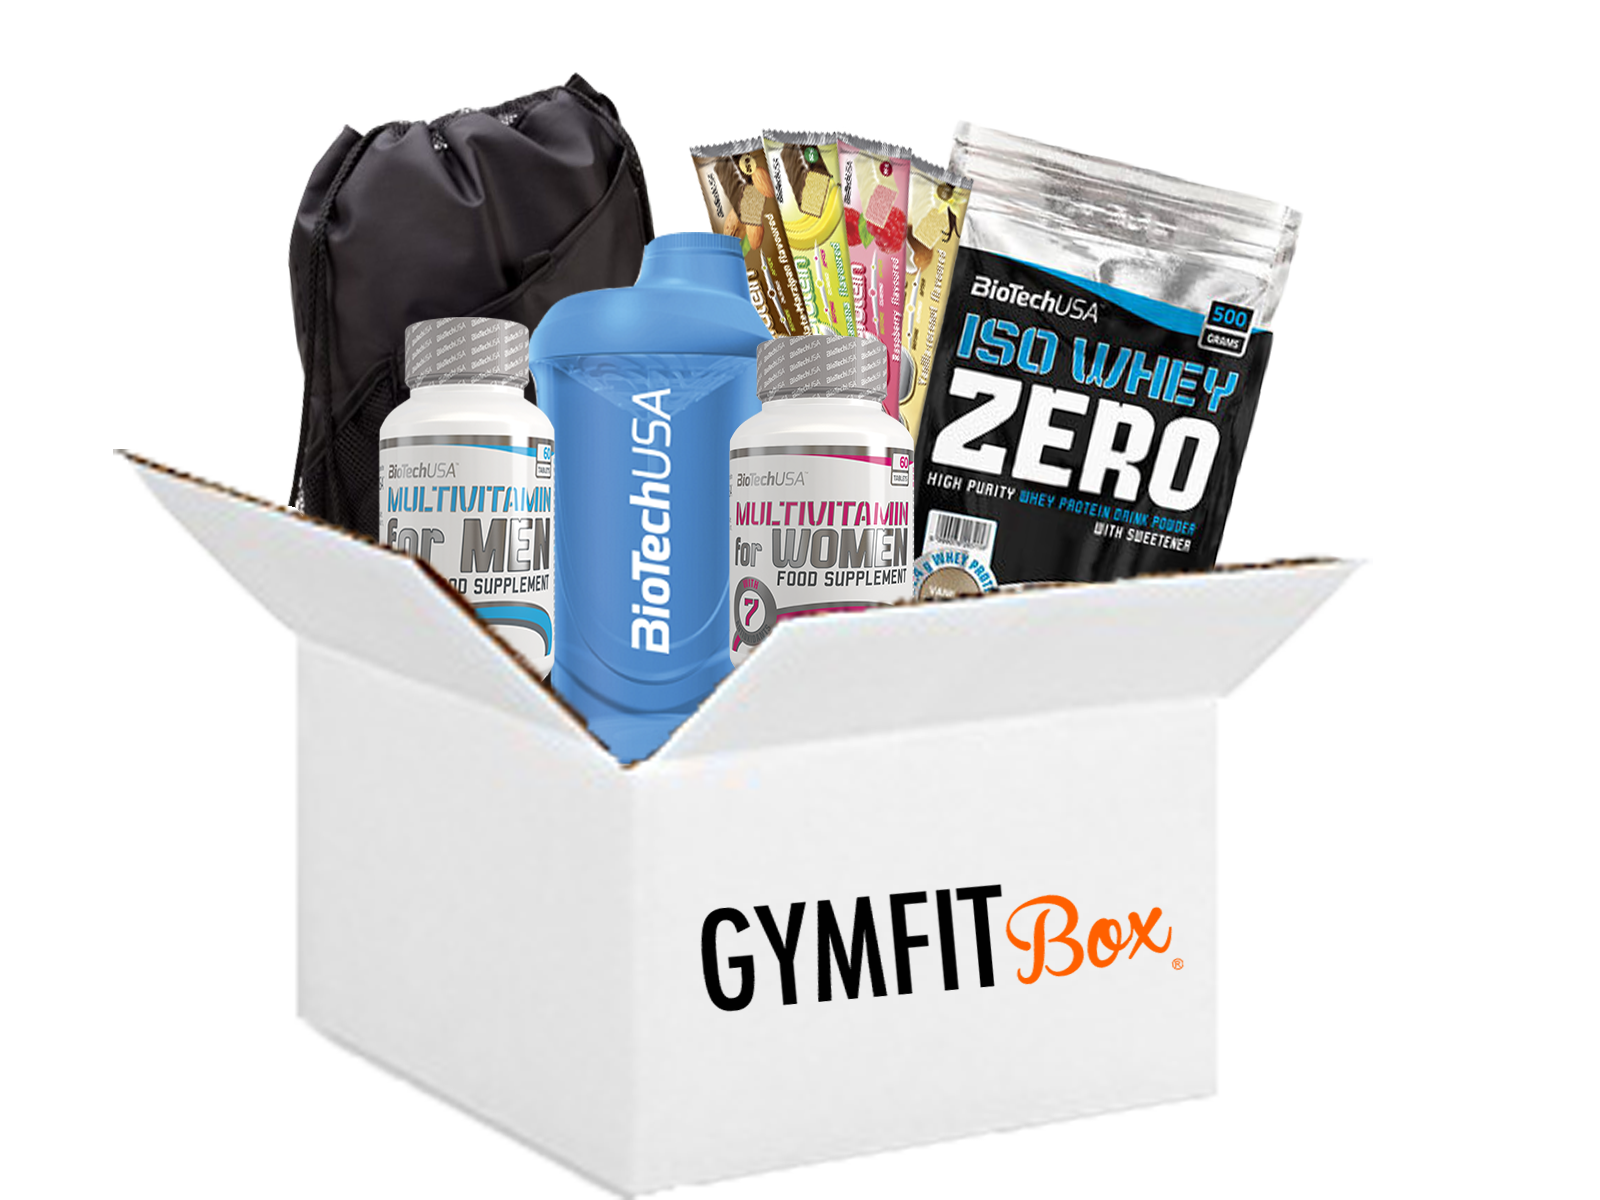 Gymfitbox Julio 2106